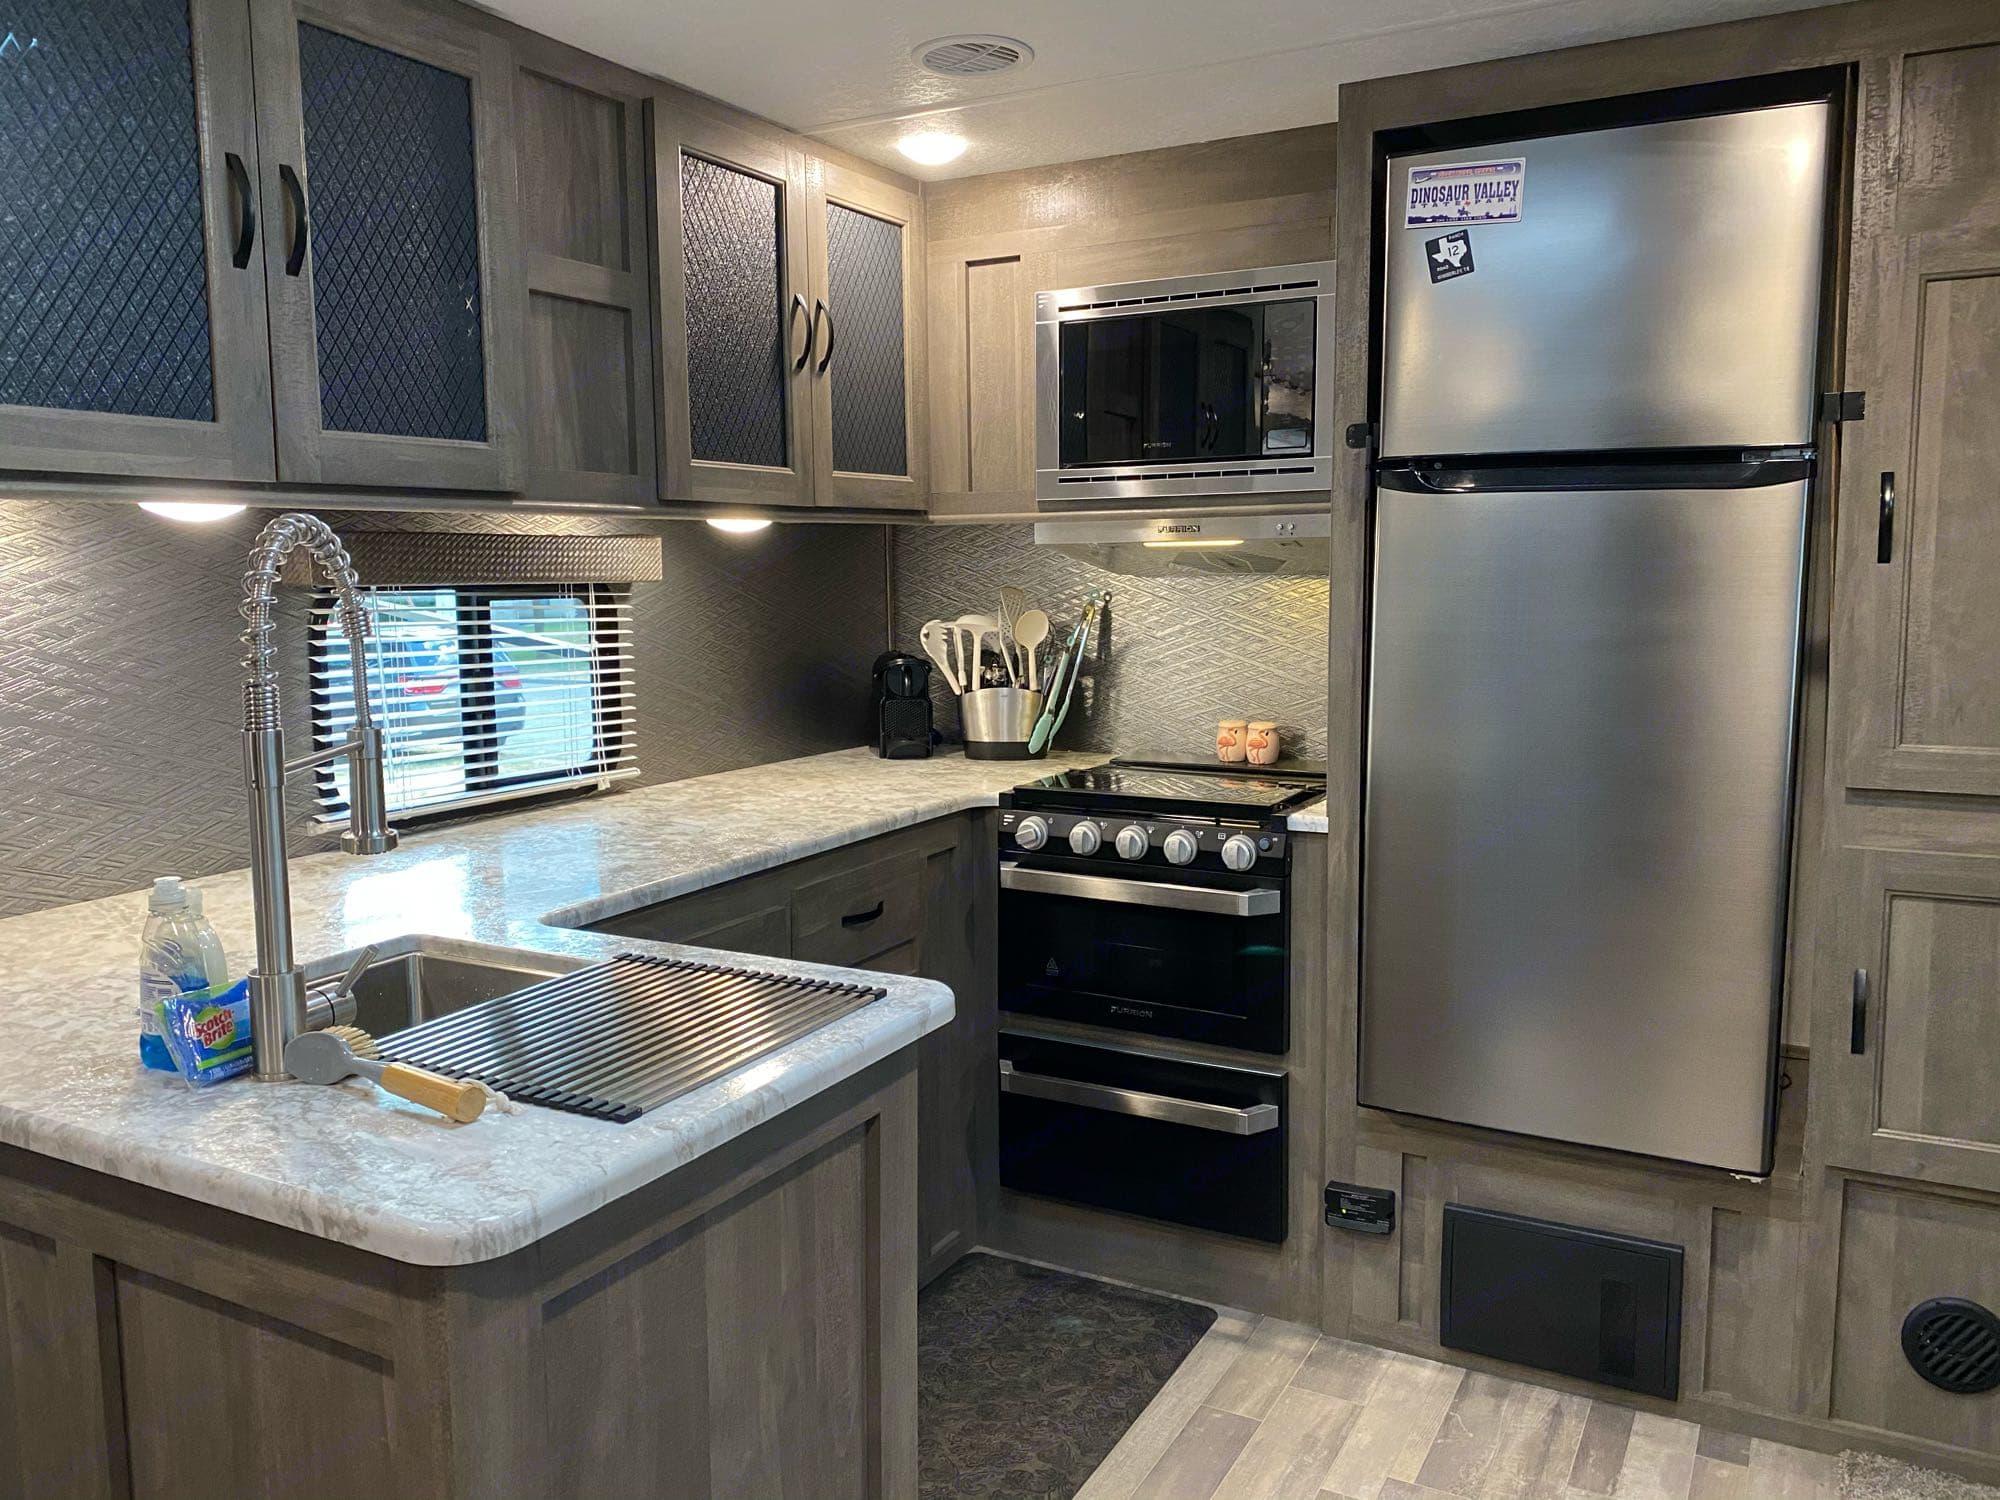 large, spacious kitchen - 3 burner stove, oven, microwave, large freezer/fridge. Forest River Vibe 2020